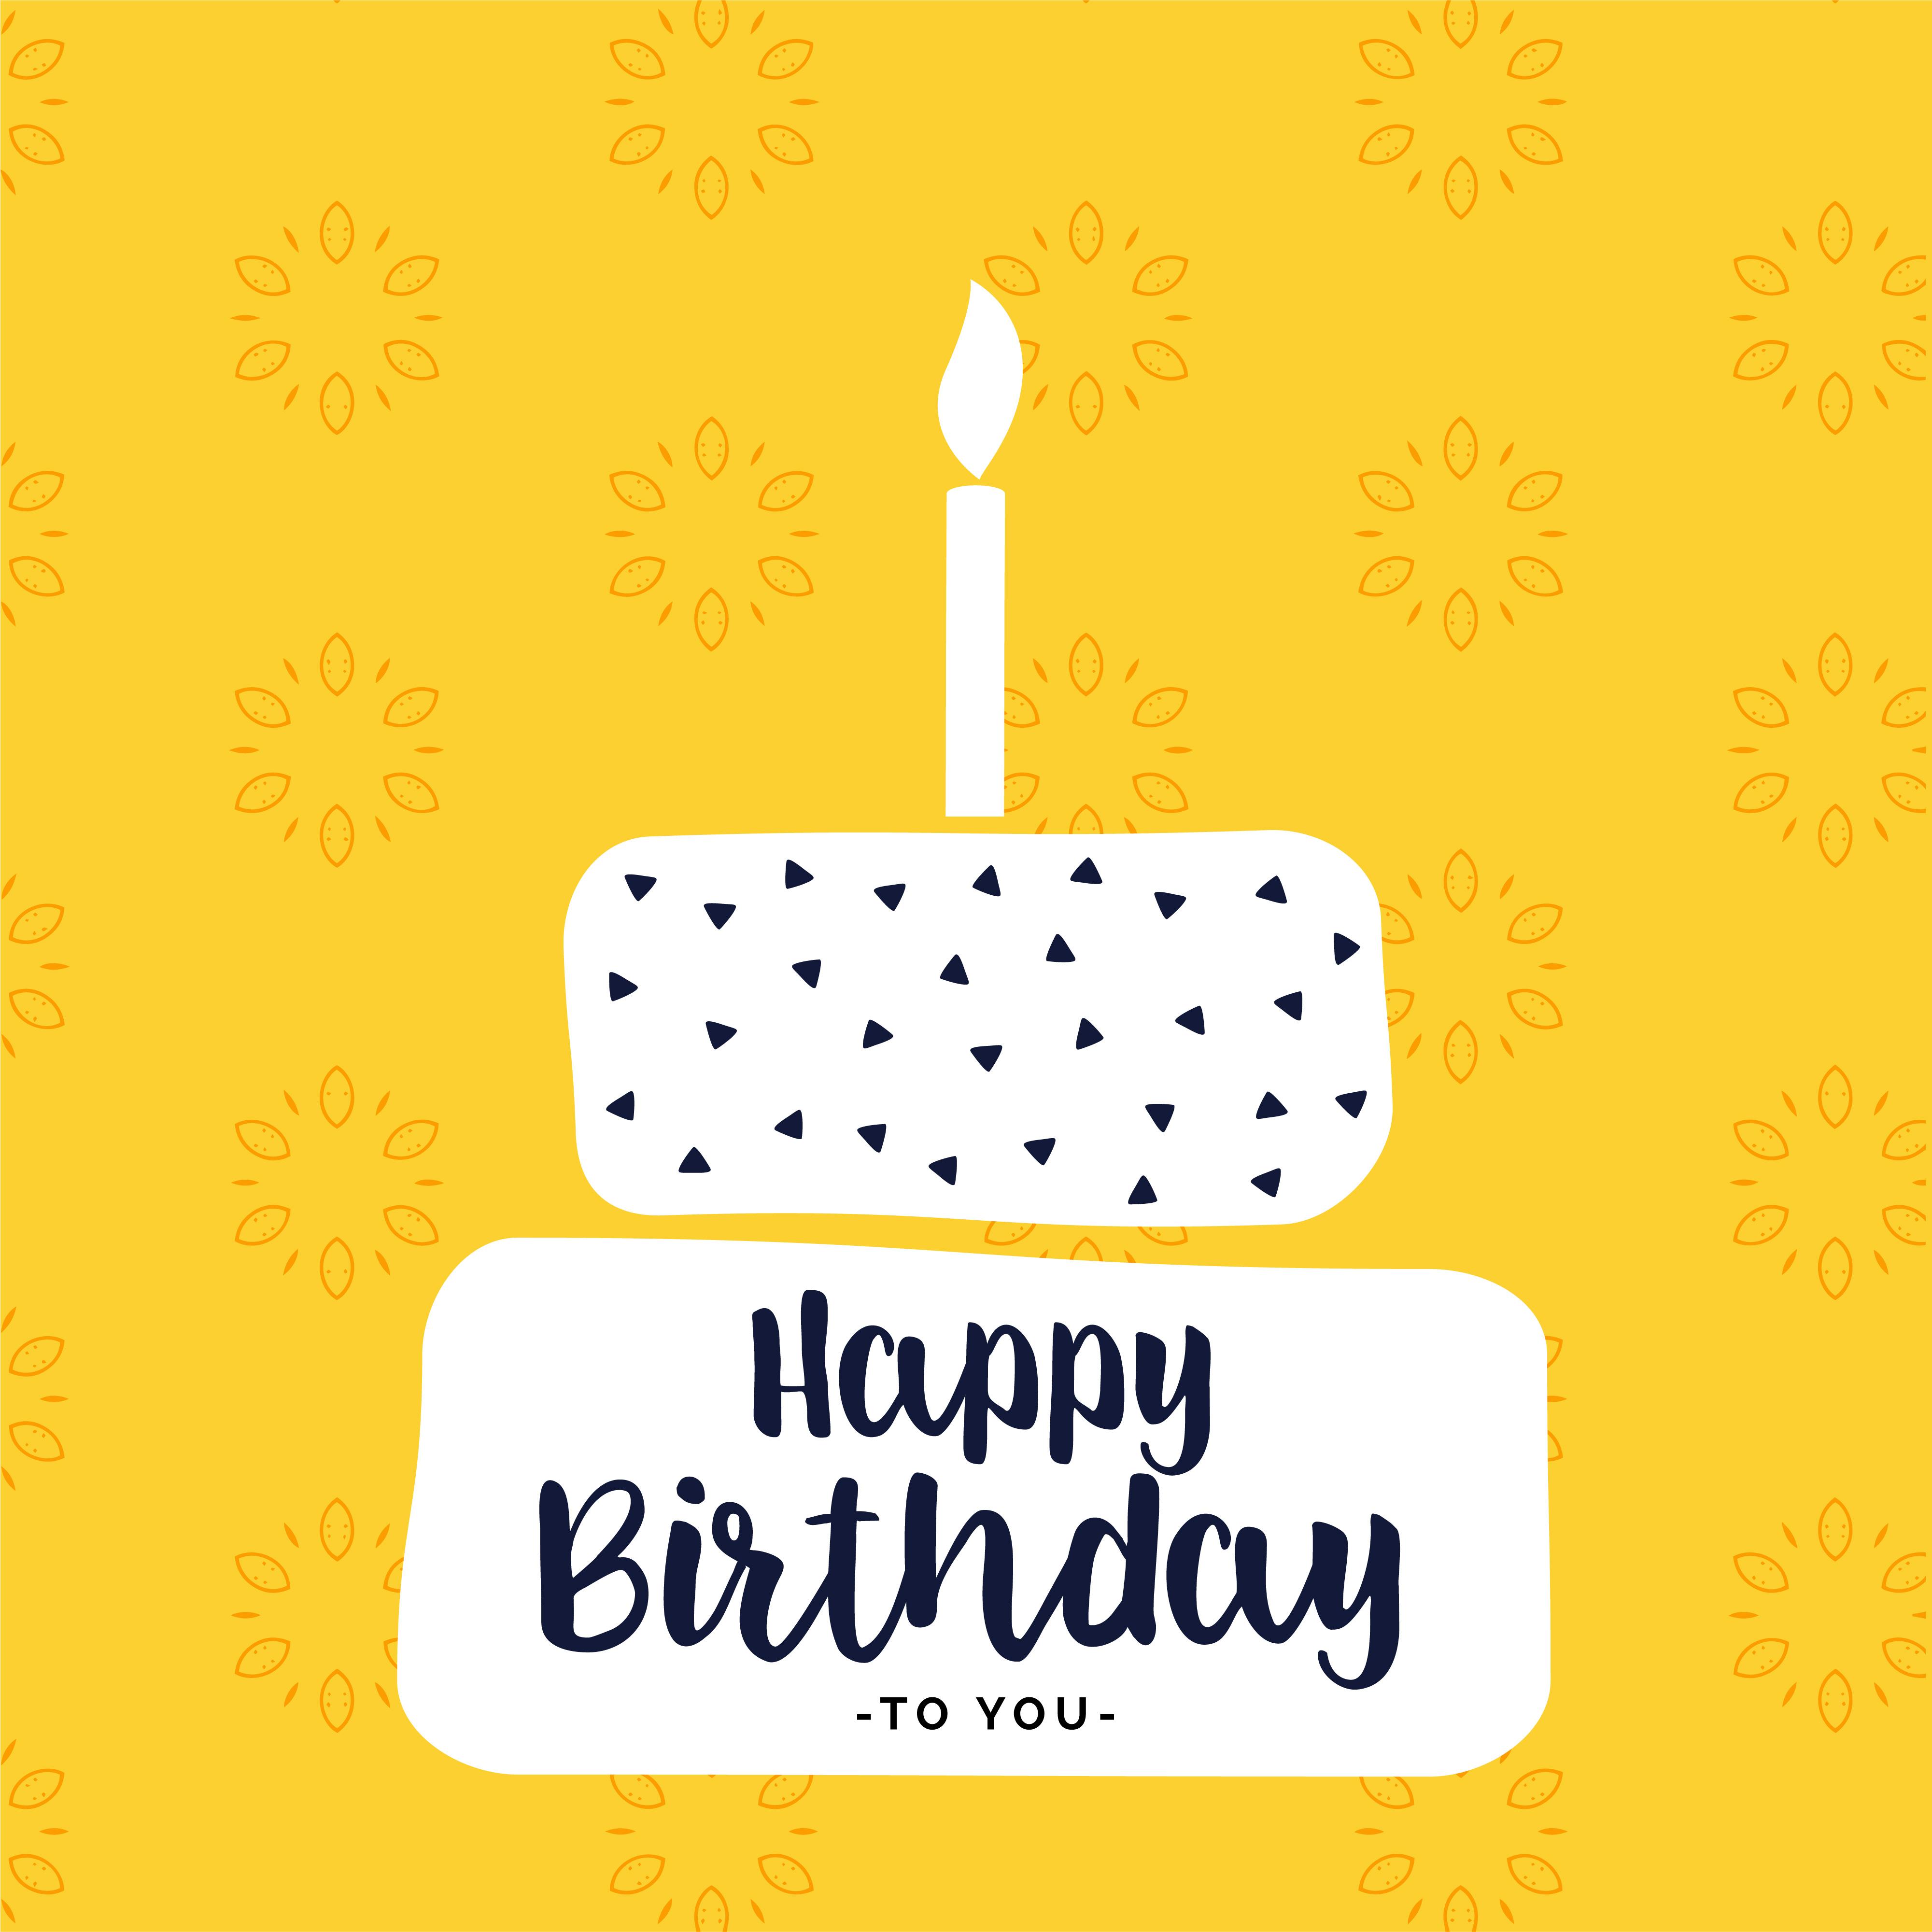 Happy Bithday Card Design With Flat White Cake Shape Telechargez